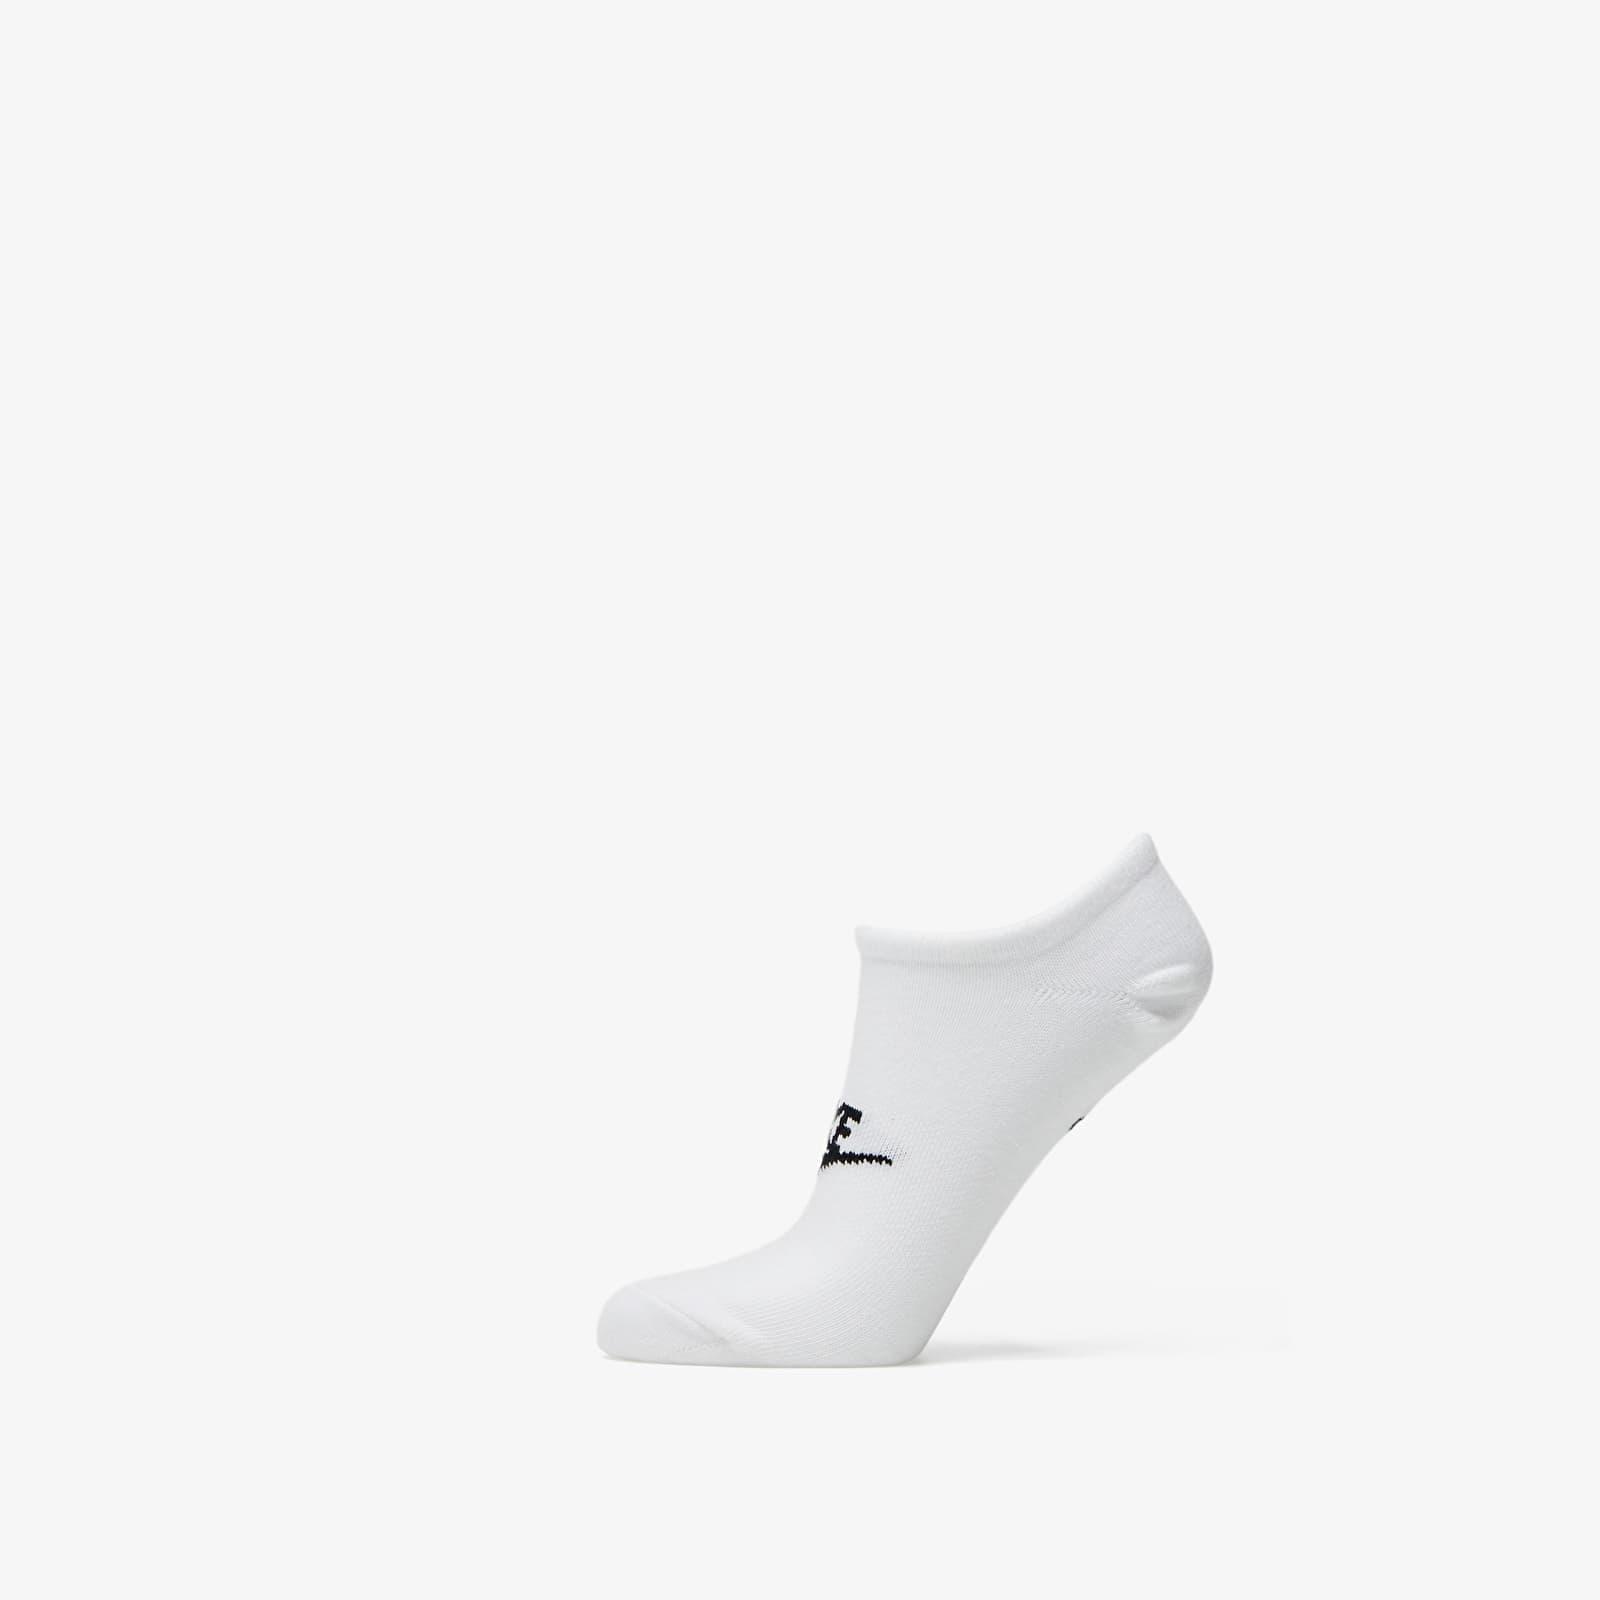 Socken Nike Sportswear Everyday Essential No Show Socks White/ Black